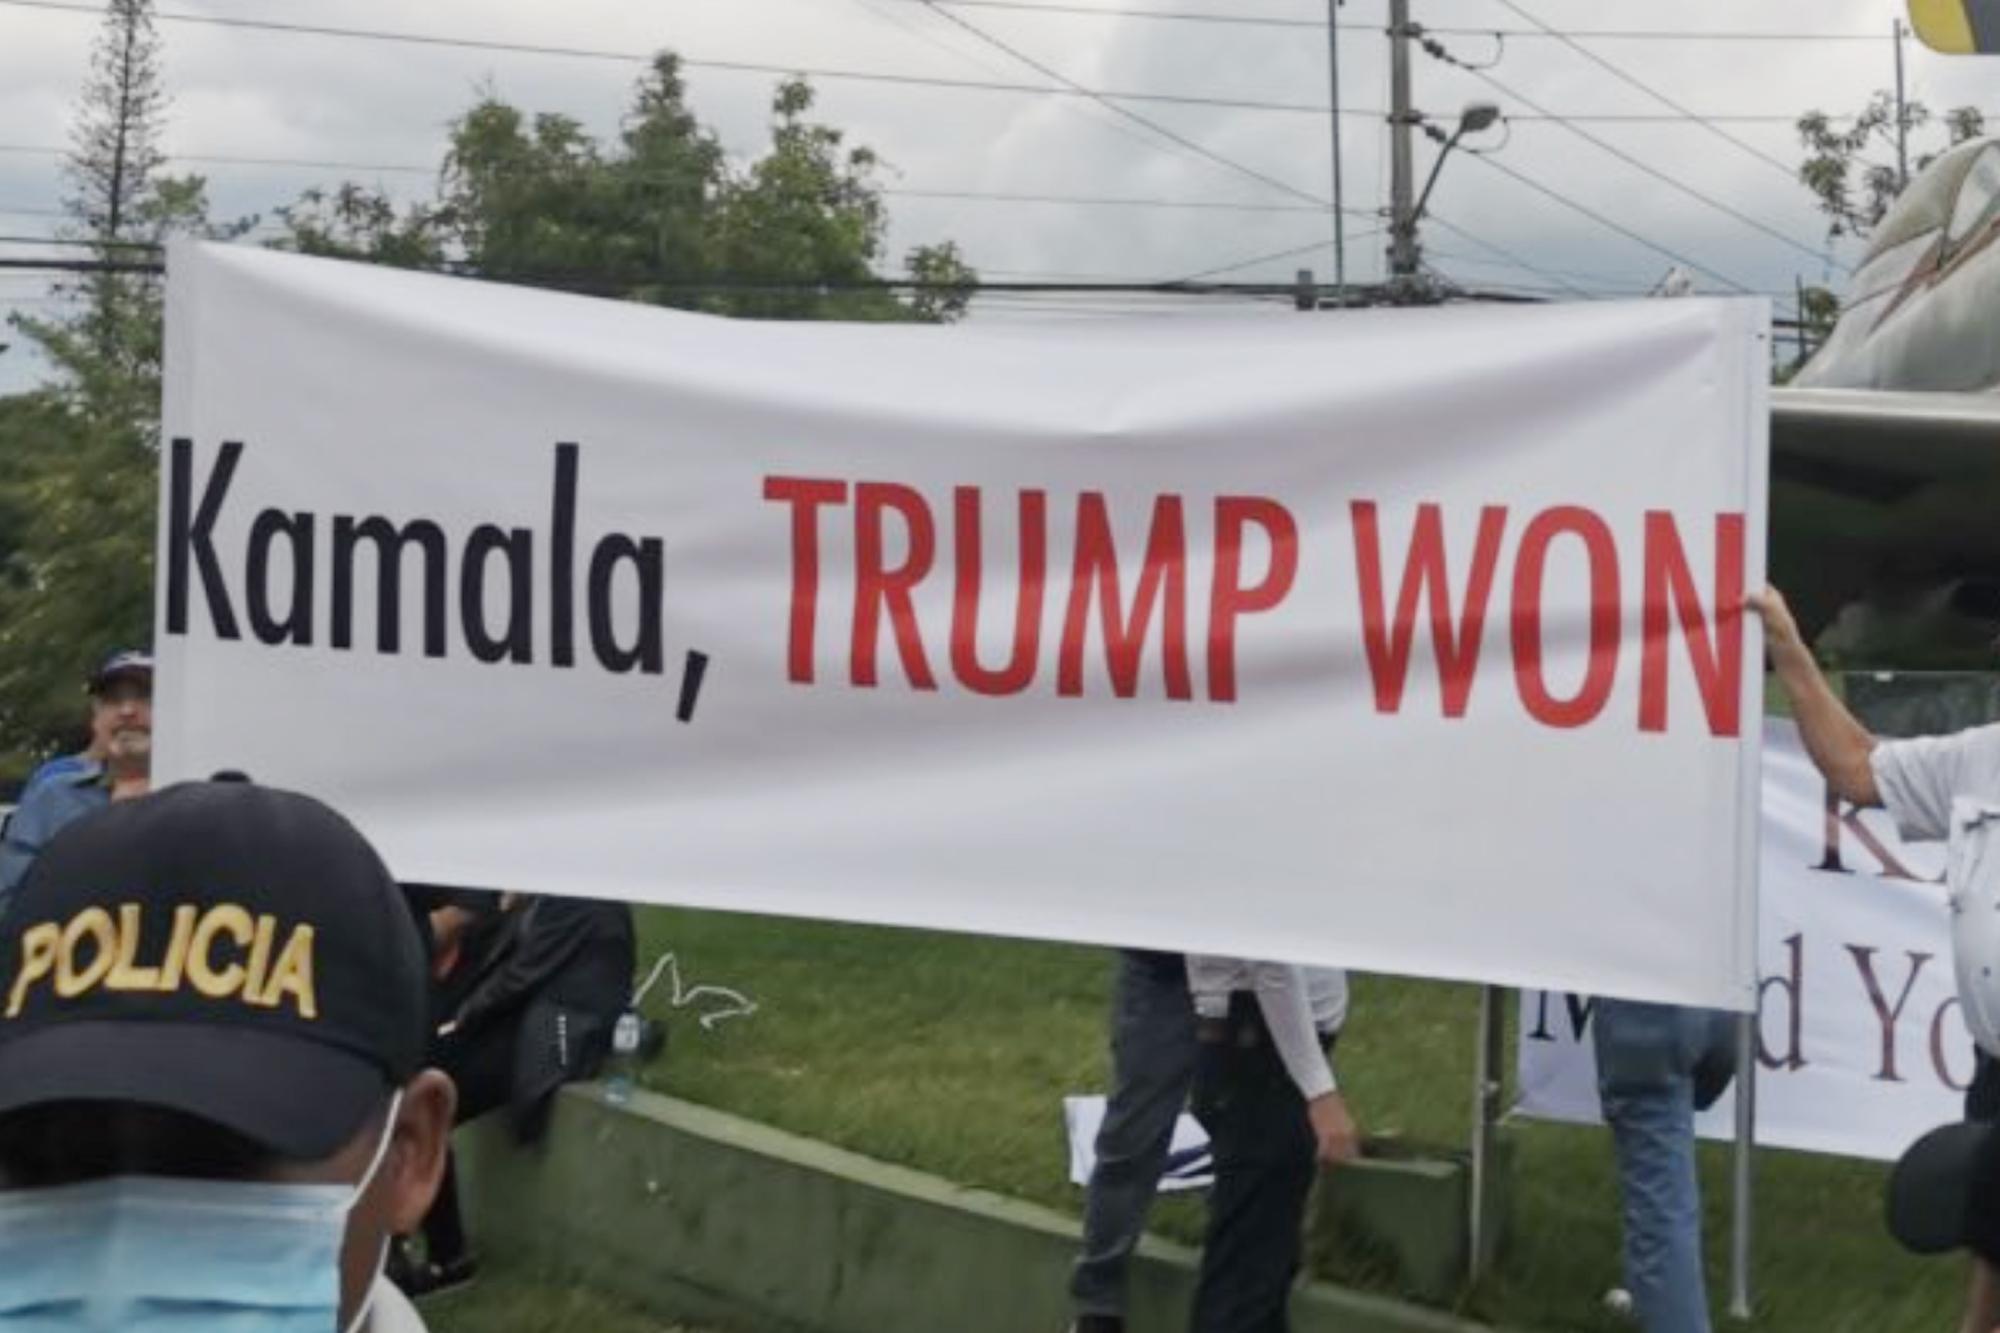 Guatemala protesters tell Kamala Harris 'Trump won'